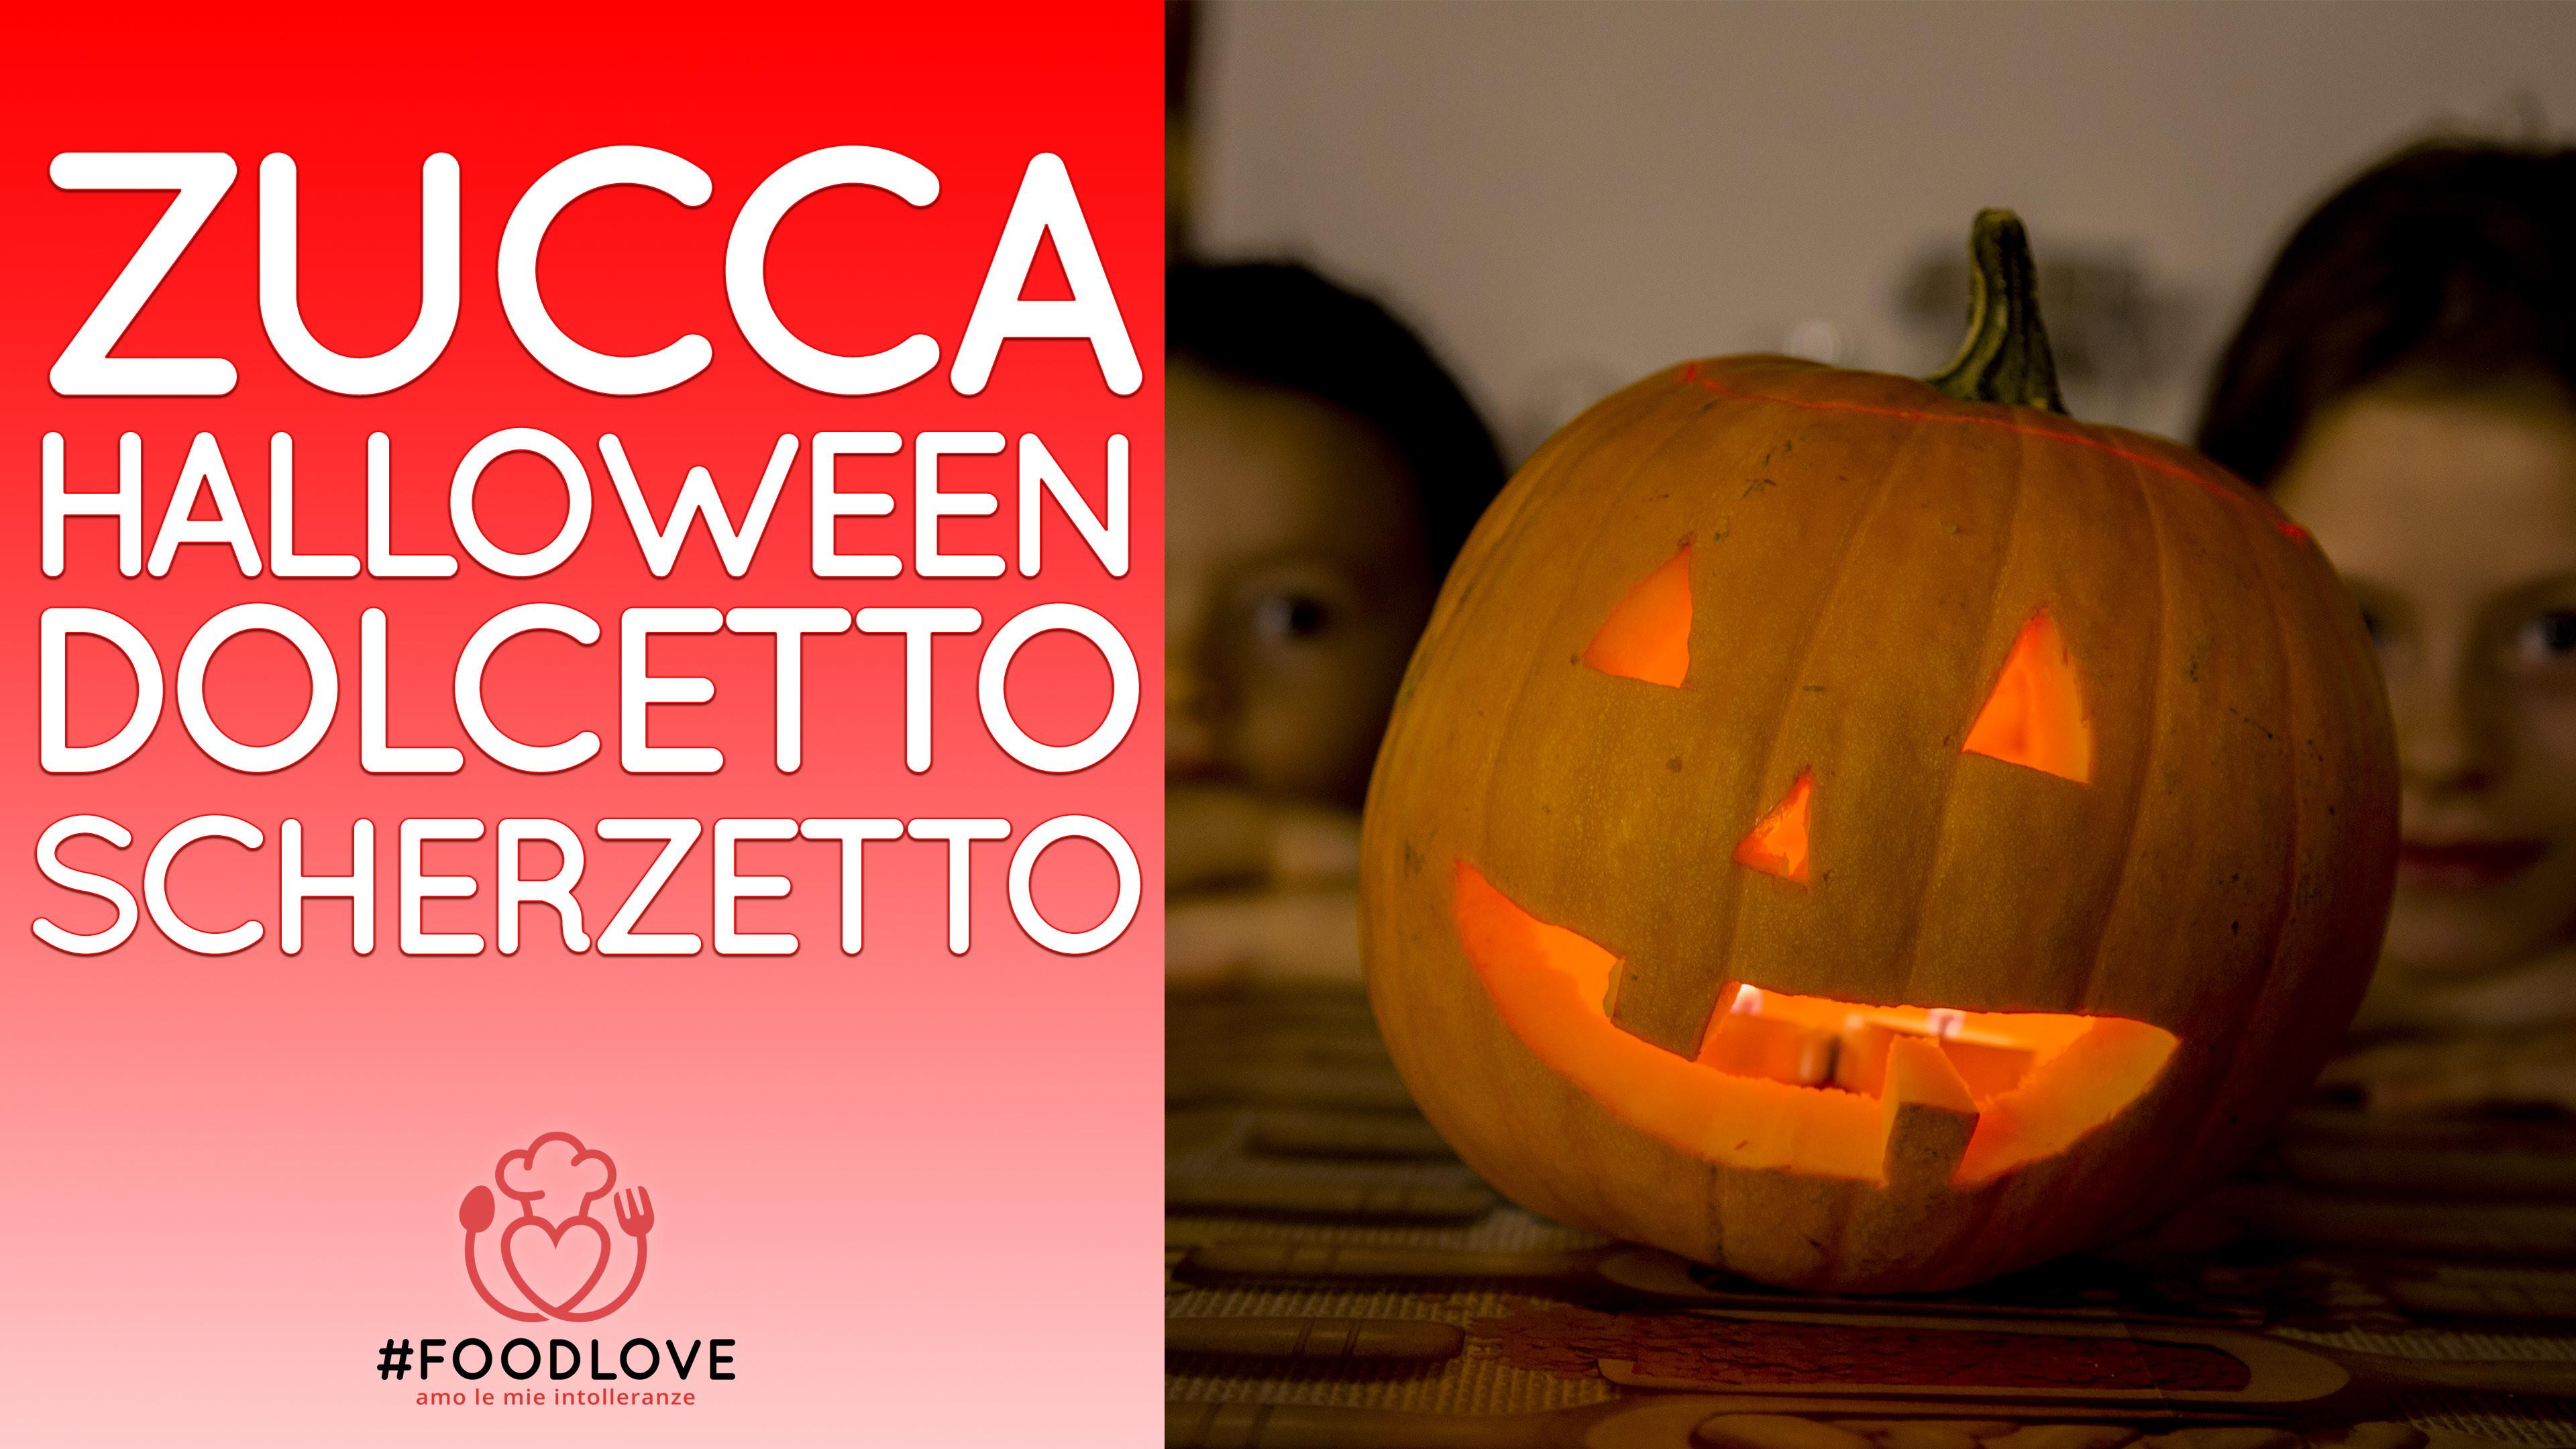 Essiccazione Zucca Di Halloween.Tutorial Zucca Di Halloween Come Intagliarla E Farla Durare A Lungo